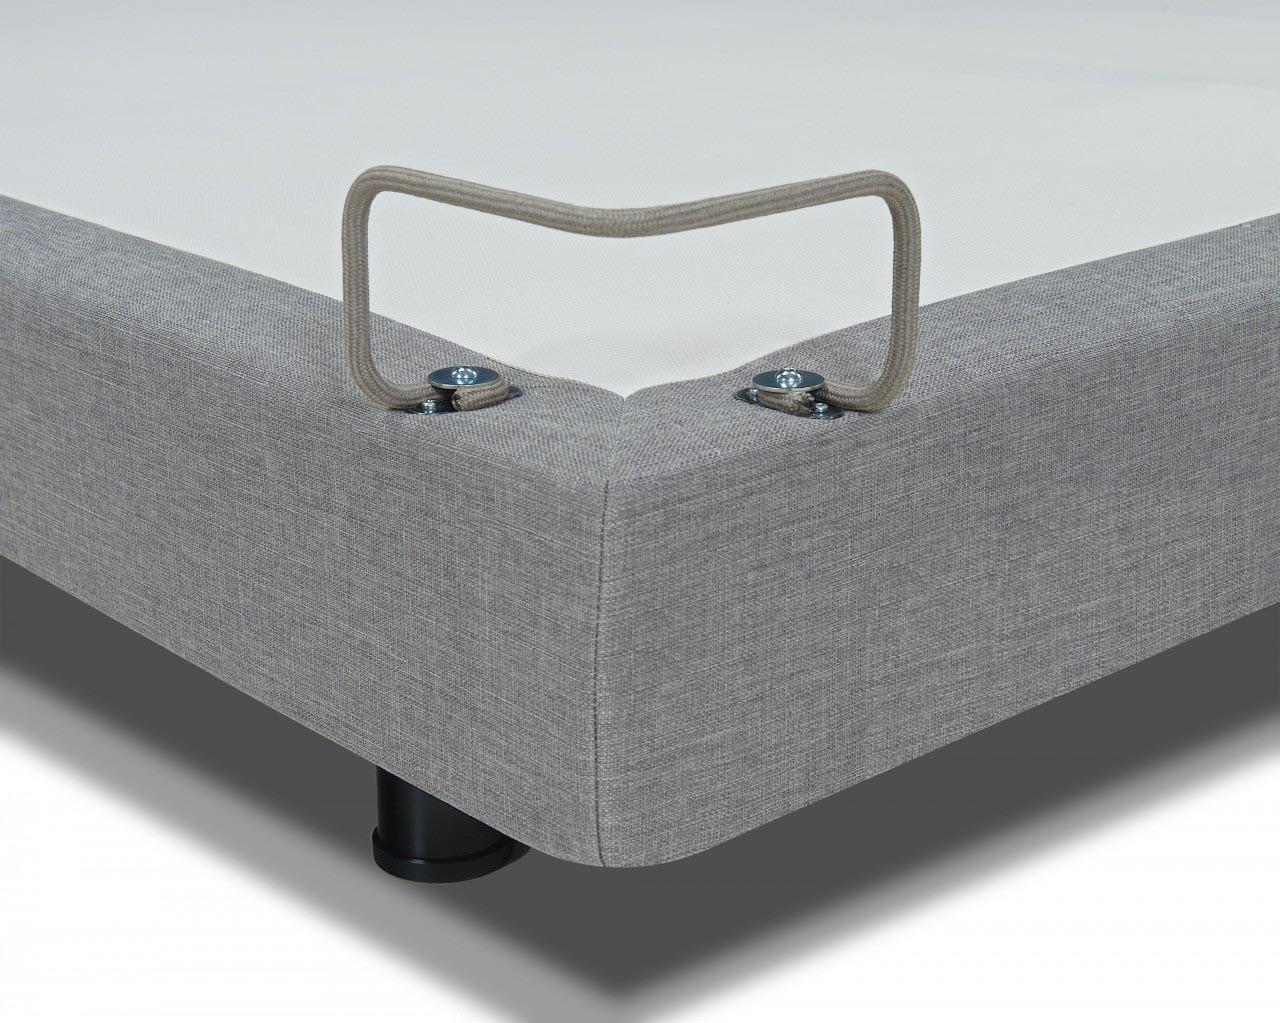 Corner Retainer Bars For Reverie Adjustable Bed Base